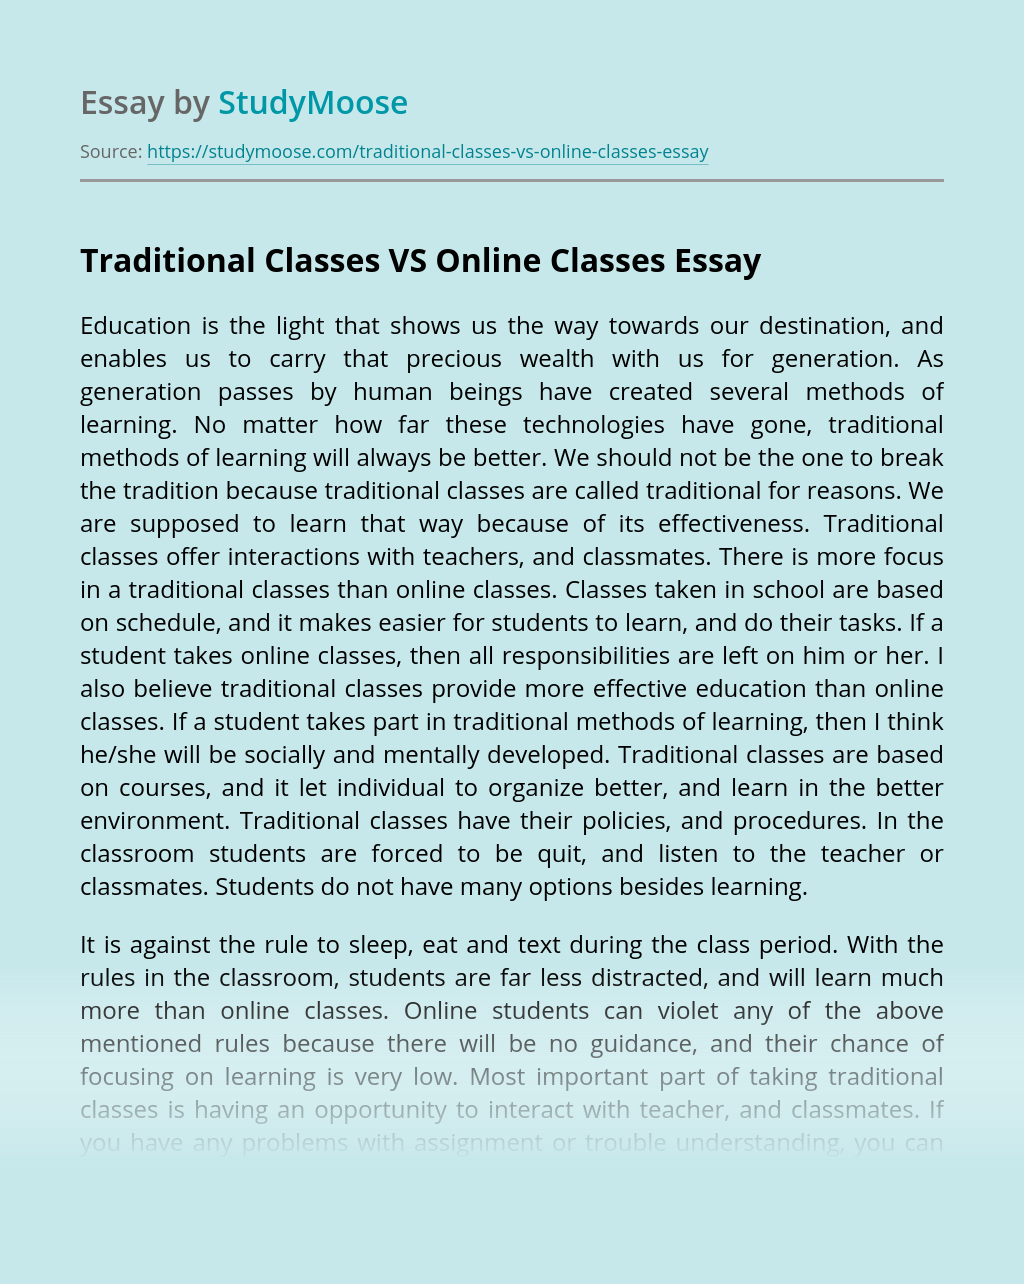 Traditional Classes VS Online Classes